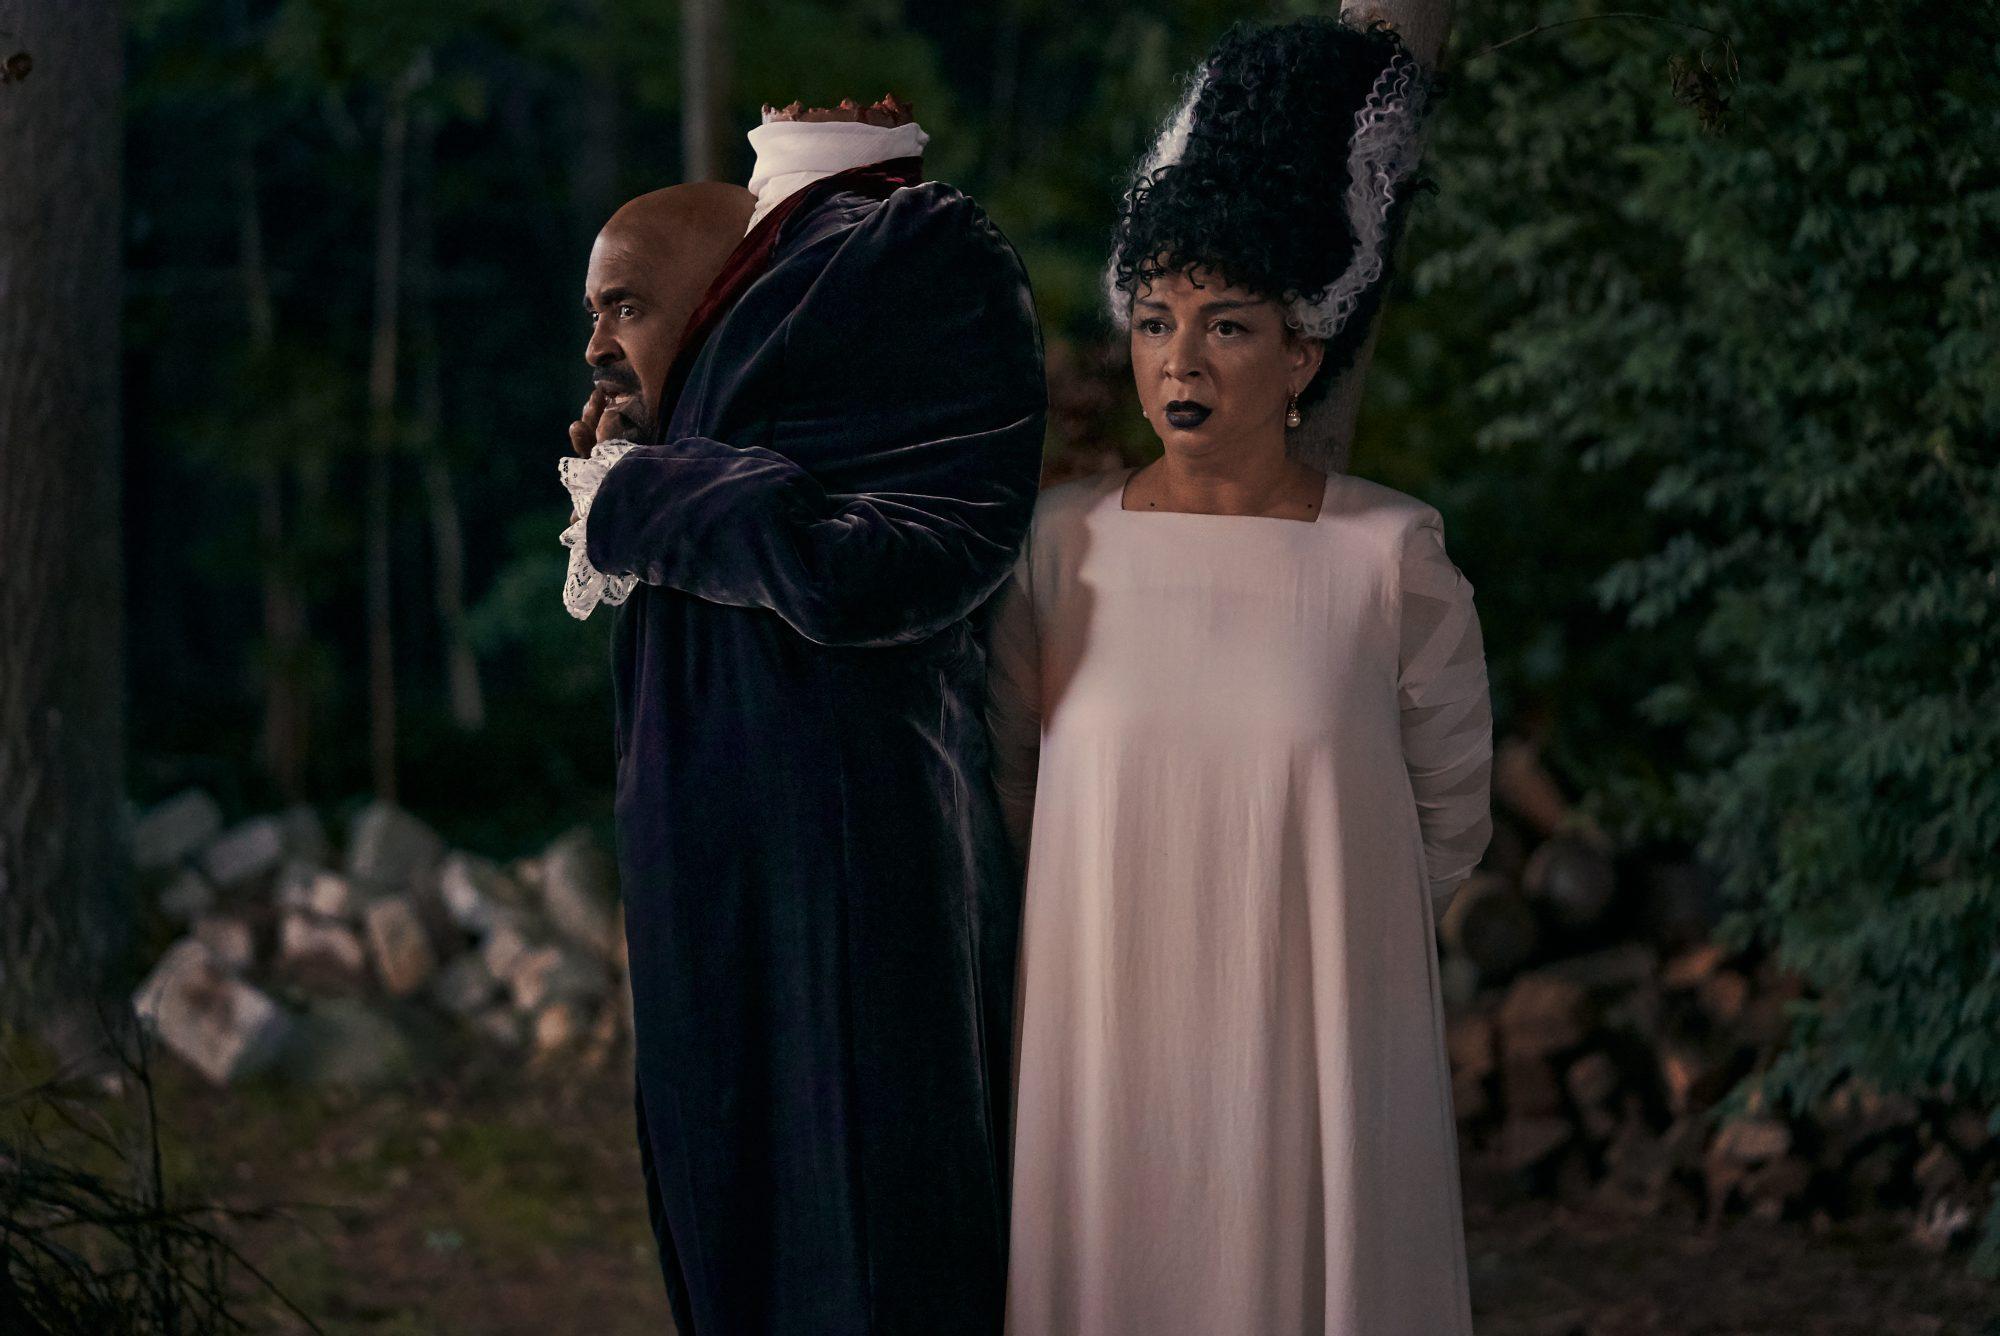 Hubie Halloween Trailer: Take a Peek at This Super Cute Upcoming Netflix Original